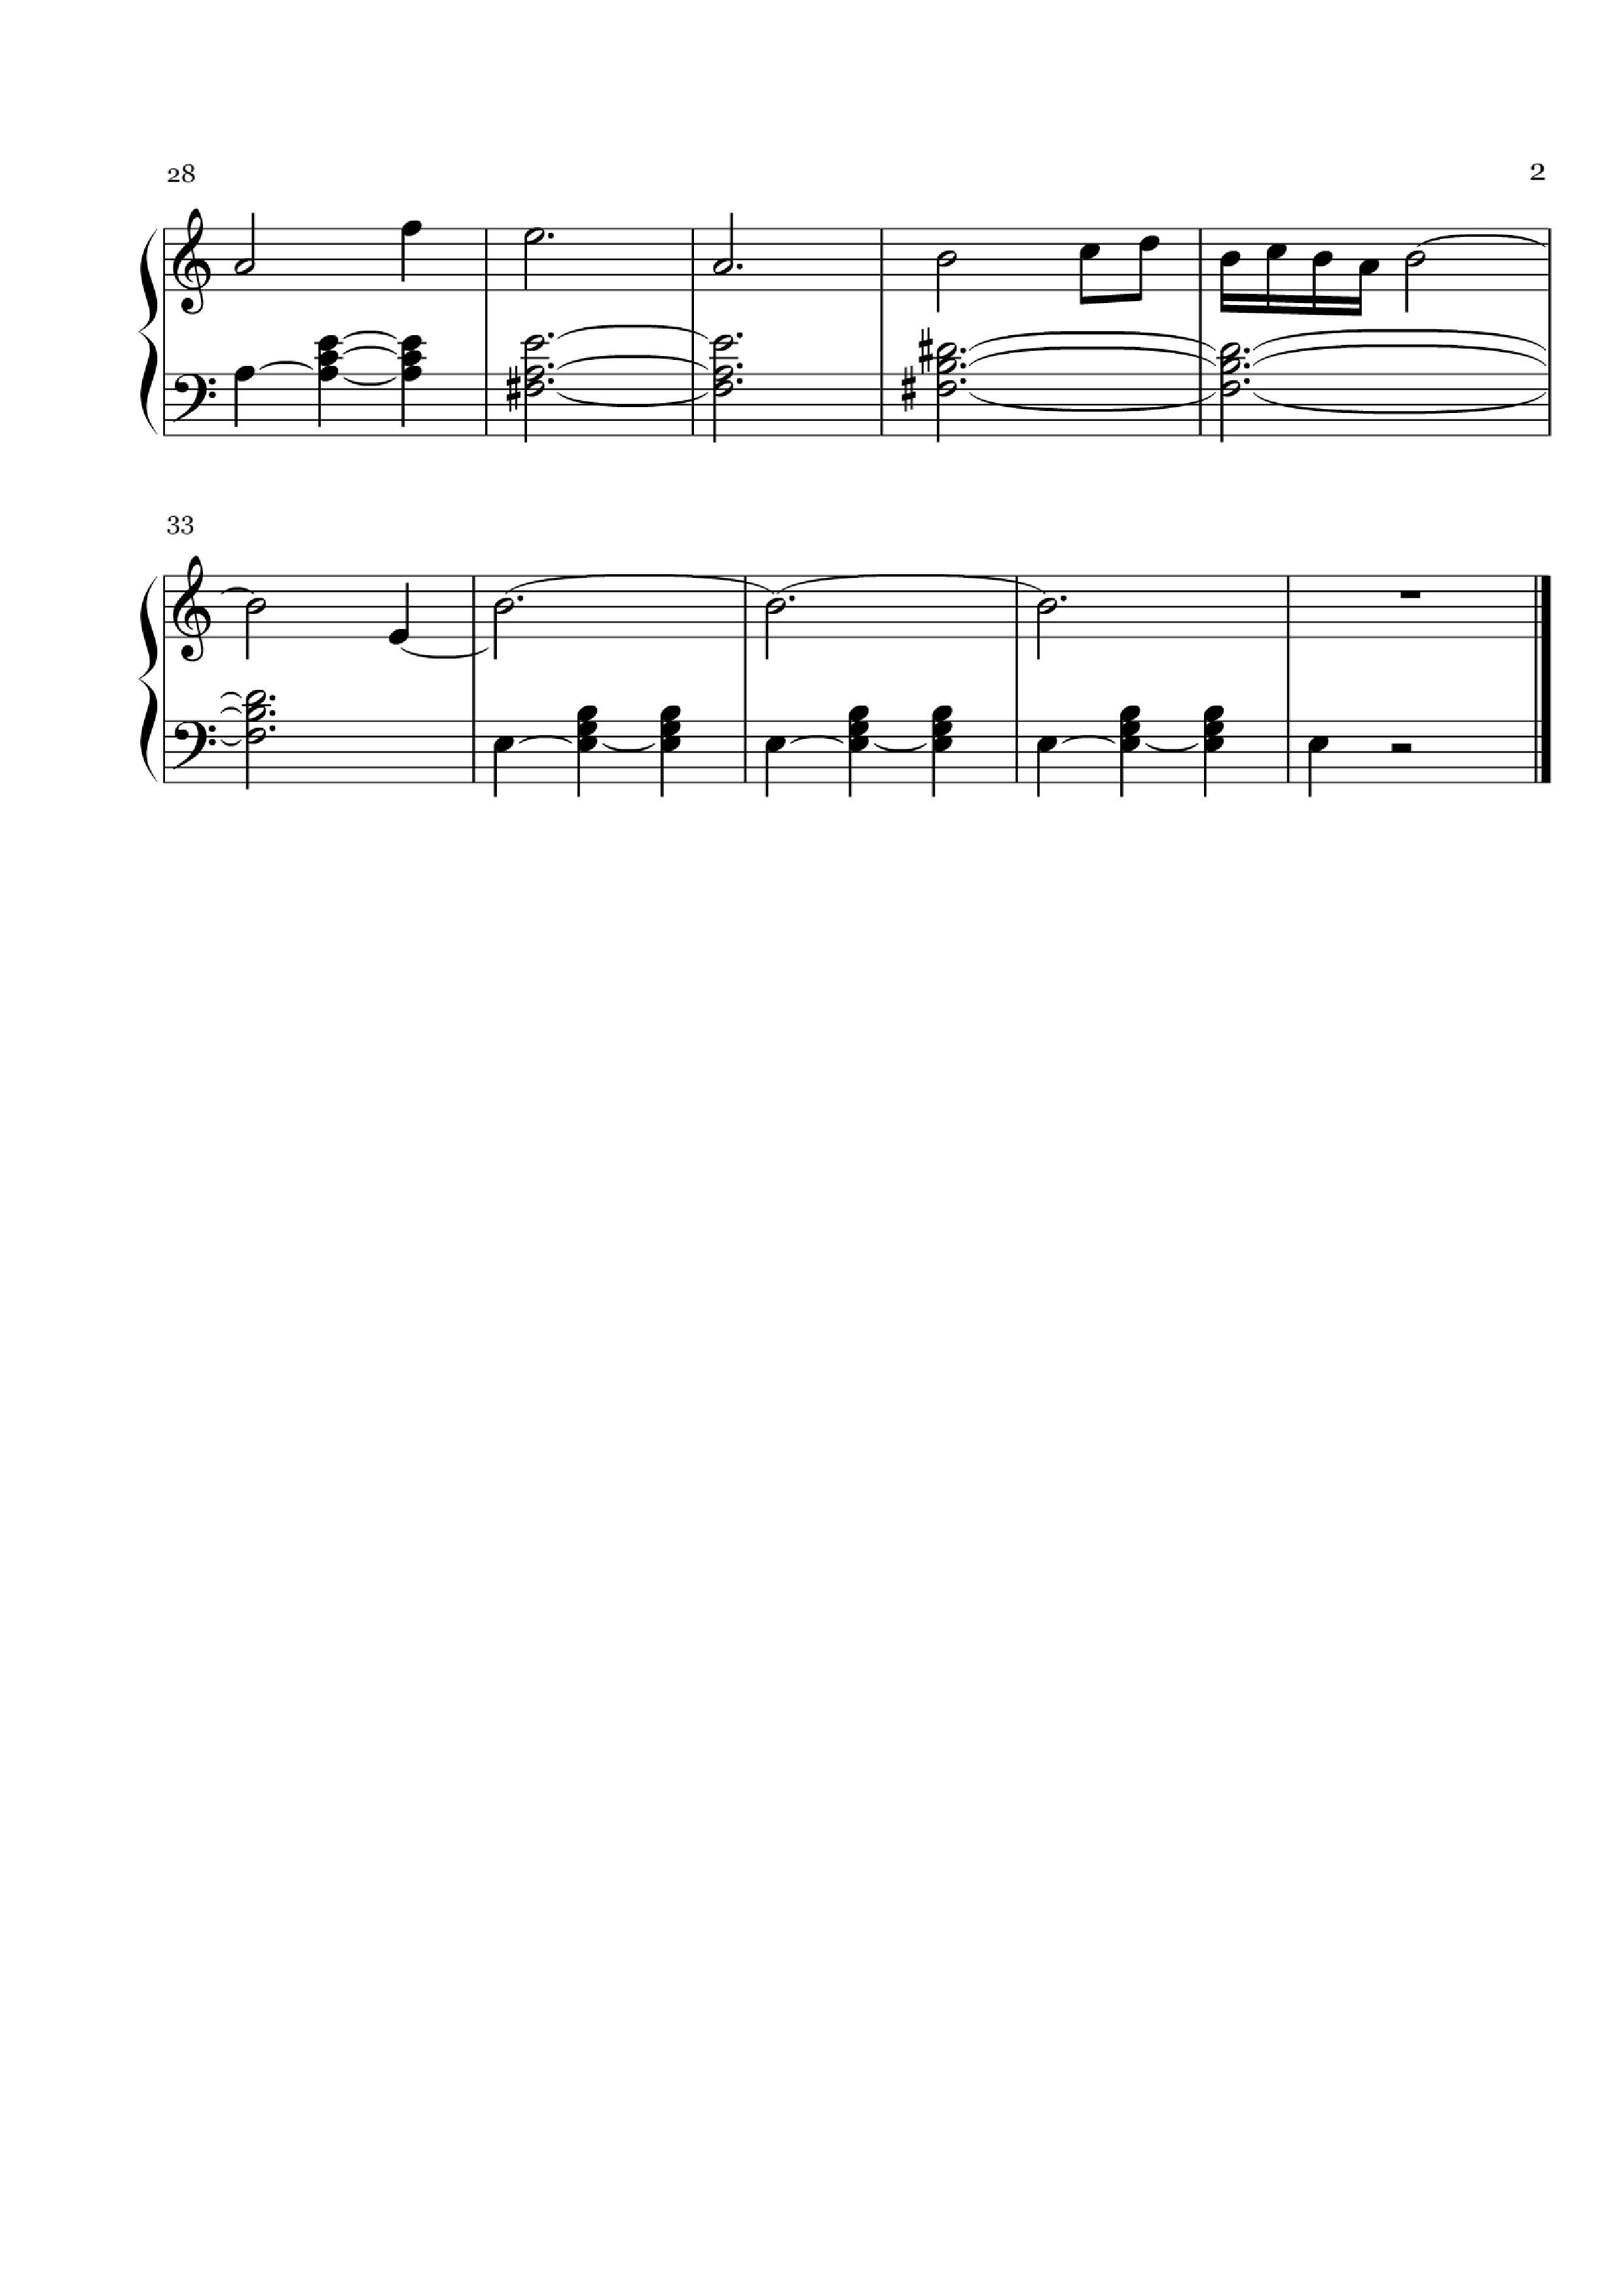 dota 2 explore 2 calm main menu music 2 sheet music